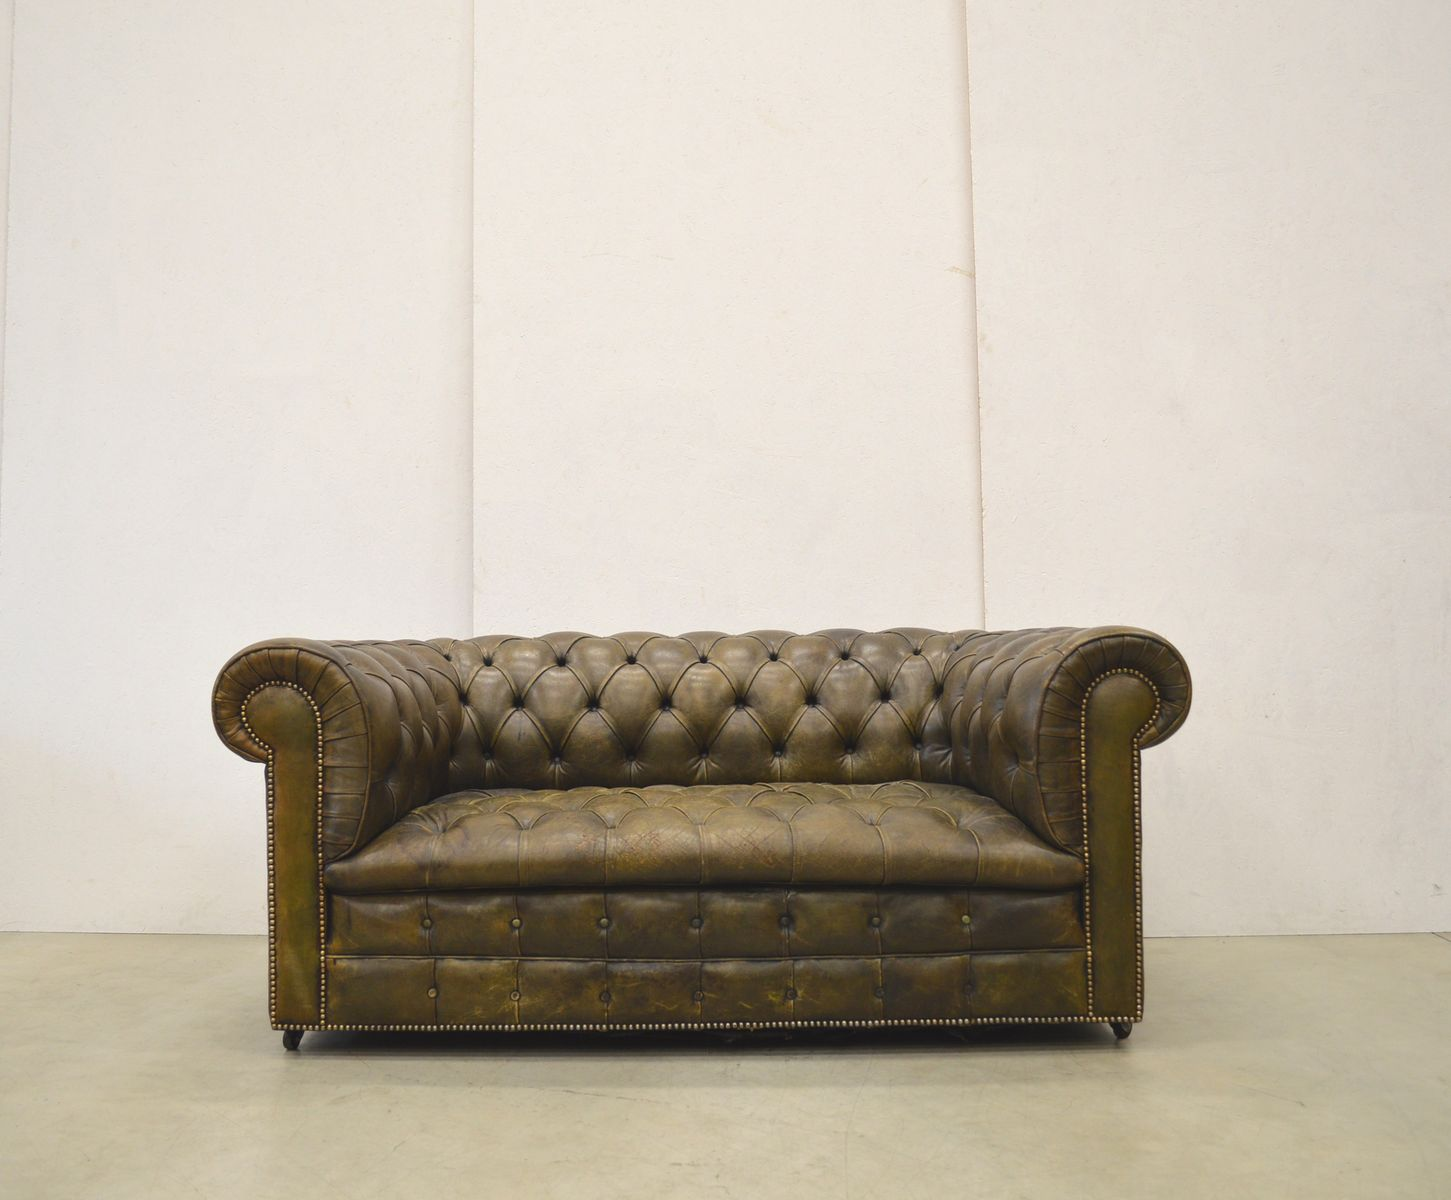 englisches olivgr nes chesterfield zwei sitzer ledersofa. Black Bedroom Furniture Sets. Home Design Ideas